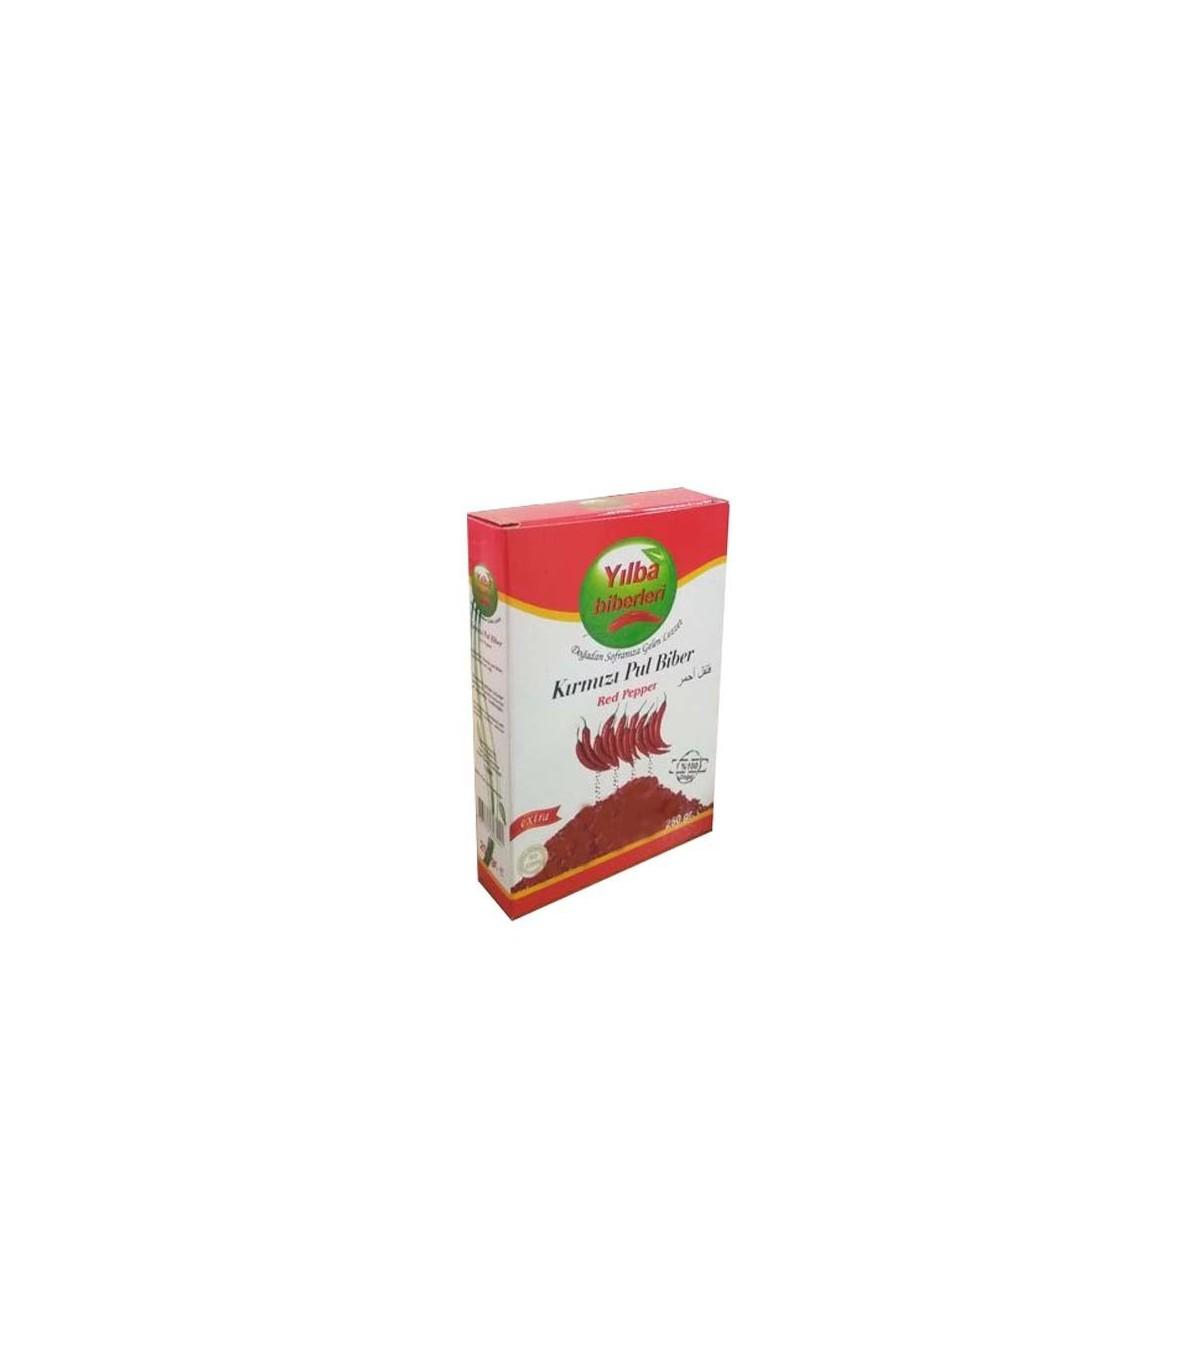 Yilba پول بیبر (فلفل قرمز گرانولی ترکیه) 250 گرم ییلبا